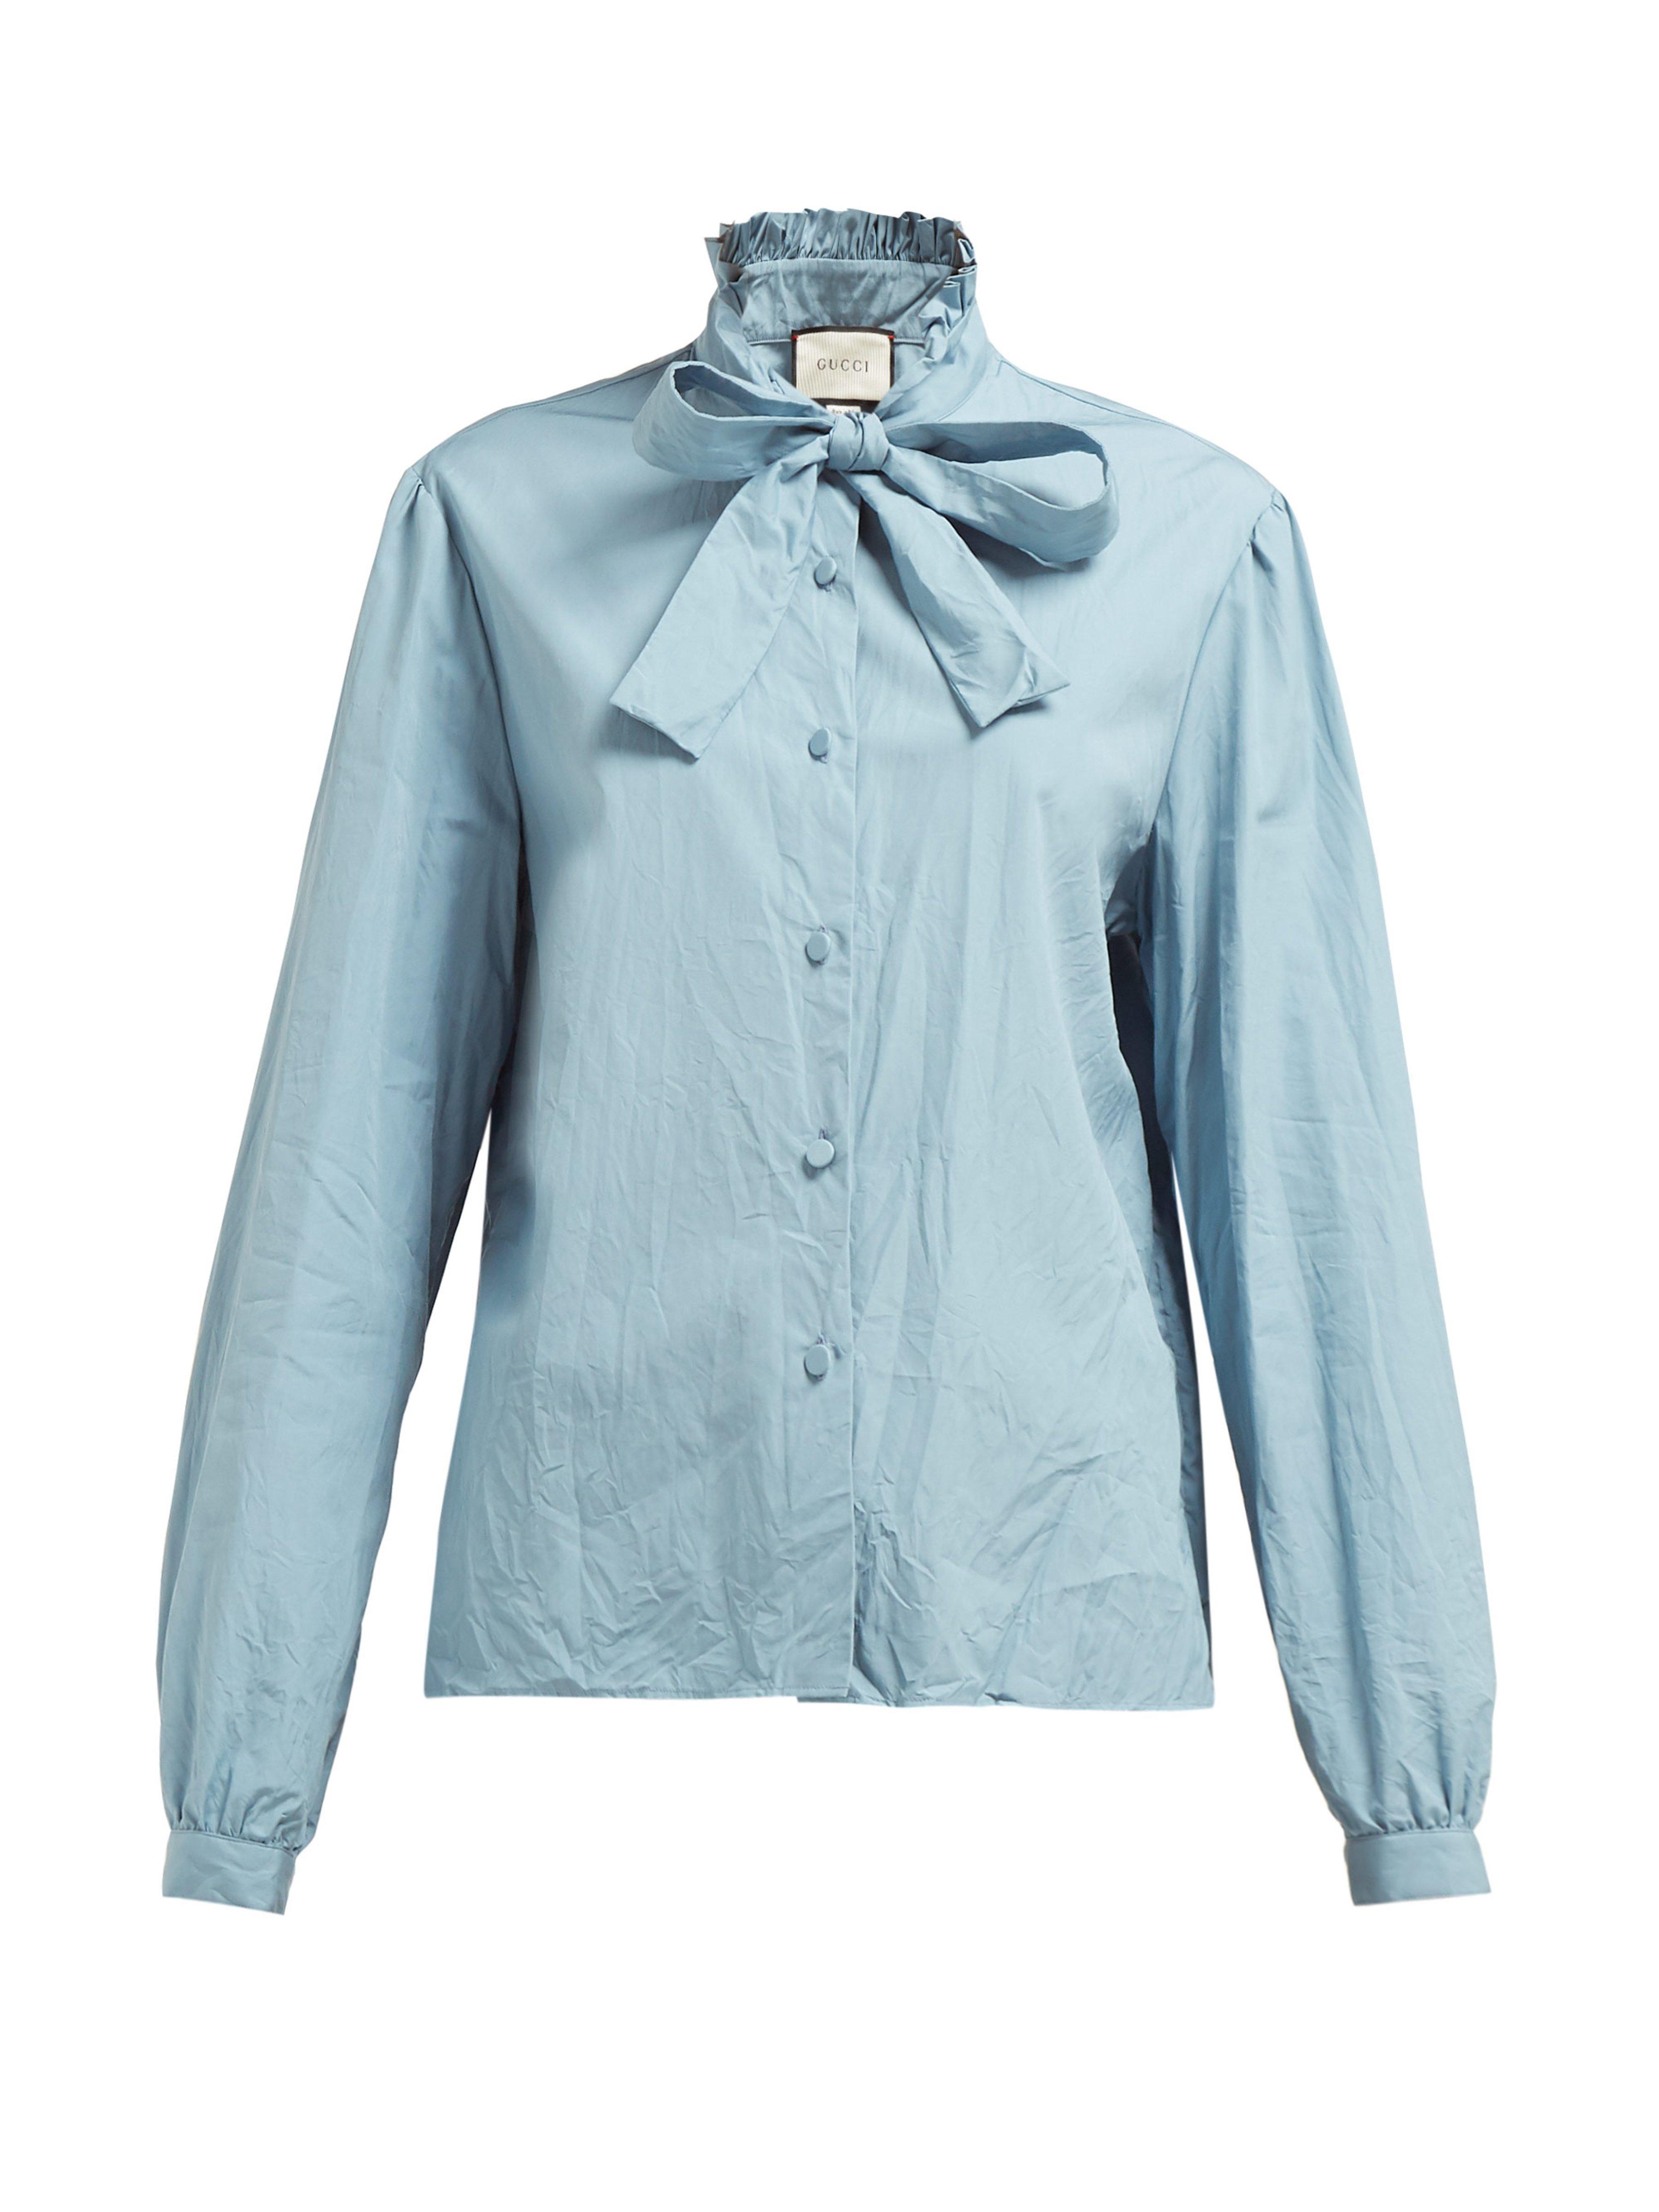 8c84cc100 Gucci Ruffled Pussy Bow Crinkled Cotton Poplin Shirt in Blue - Lyst